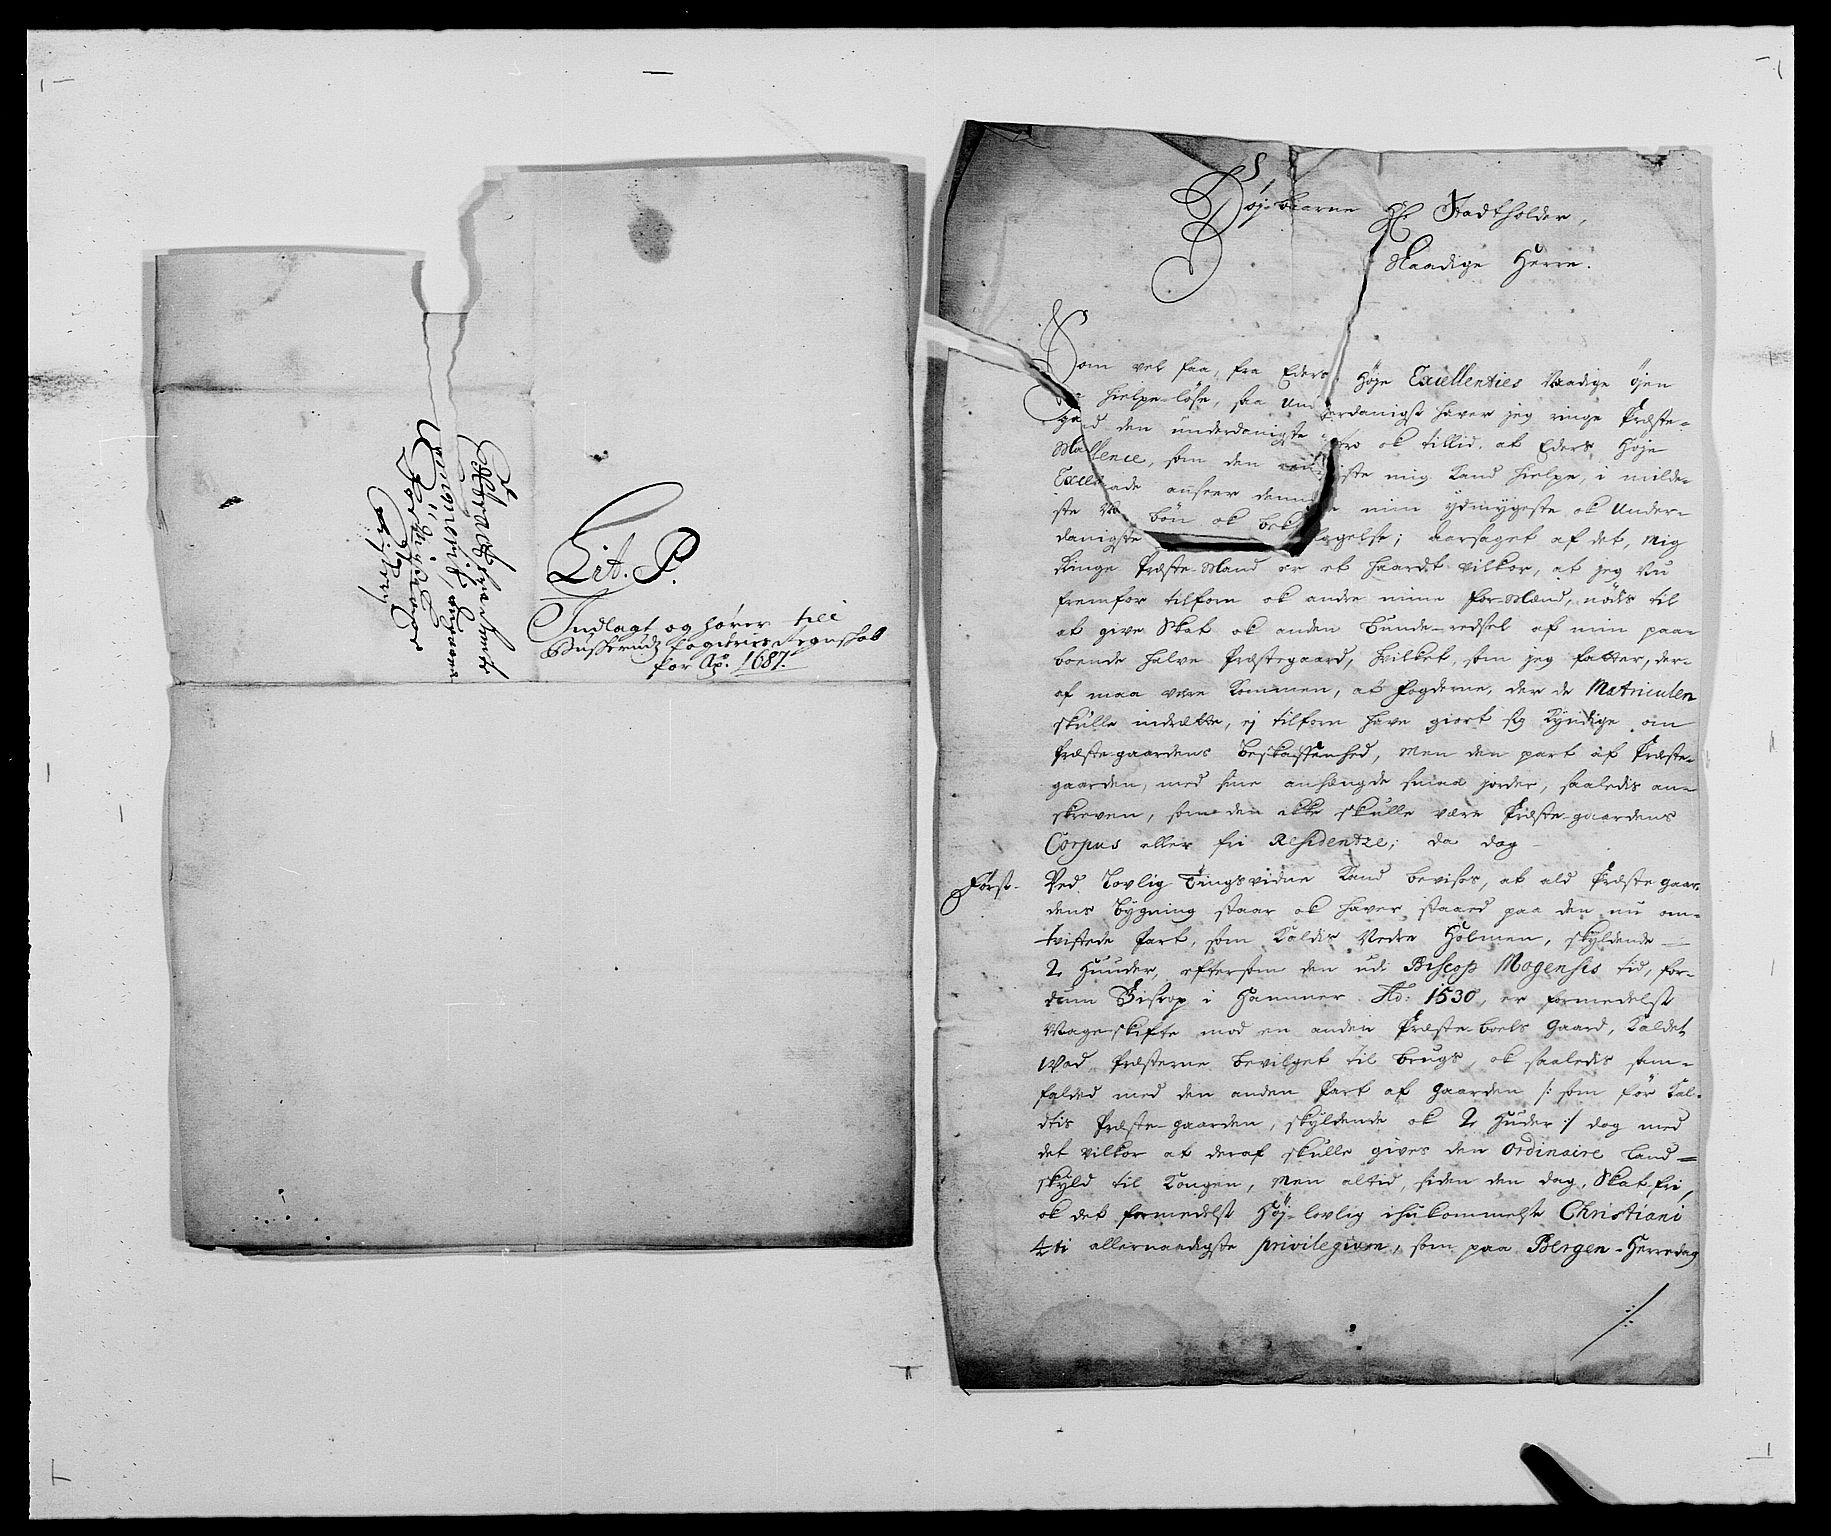 RA, Rentekammeret inntil 1814, Reviderte regnskaper, Fogderegnskap, R25/L1679: Fogderegnskap Buskerud, 1687-1688, s. 241